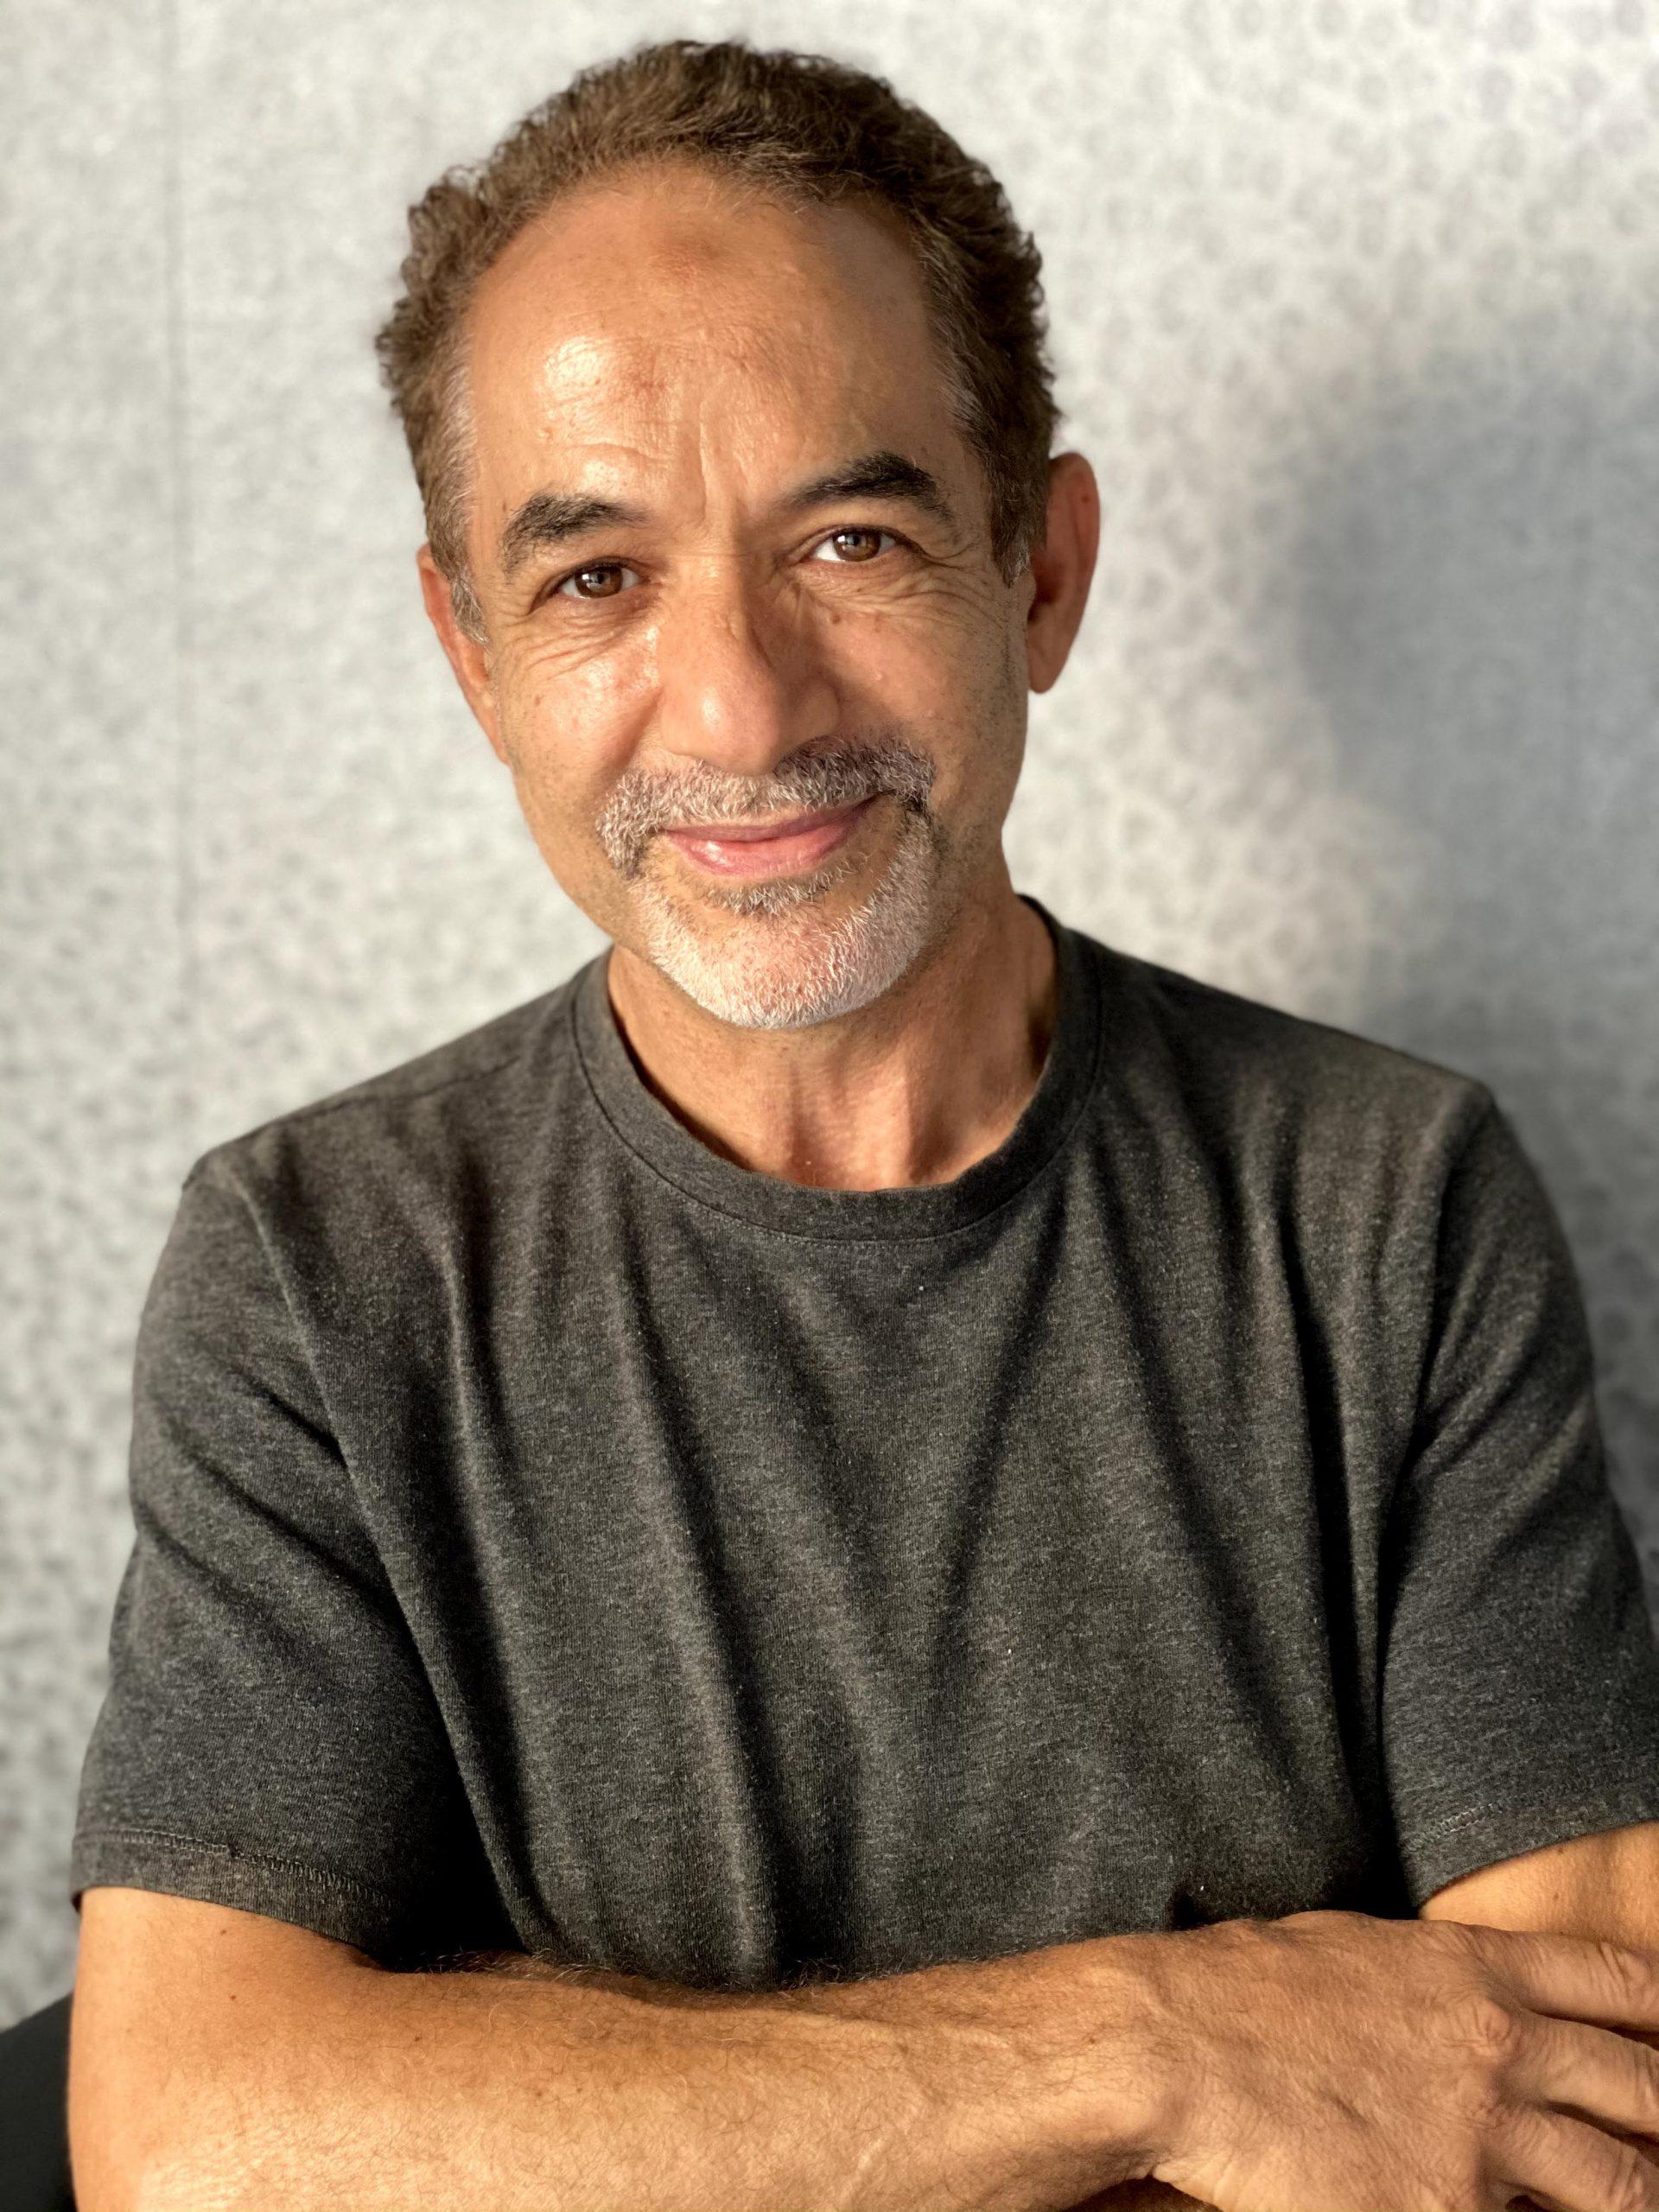 Brahim Marzouk